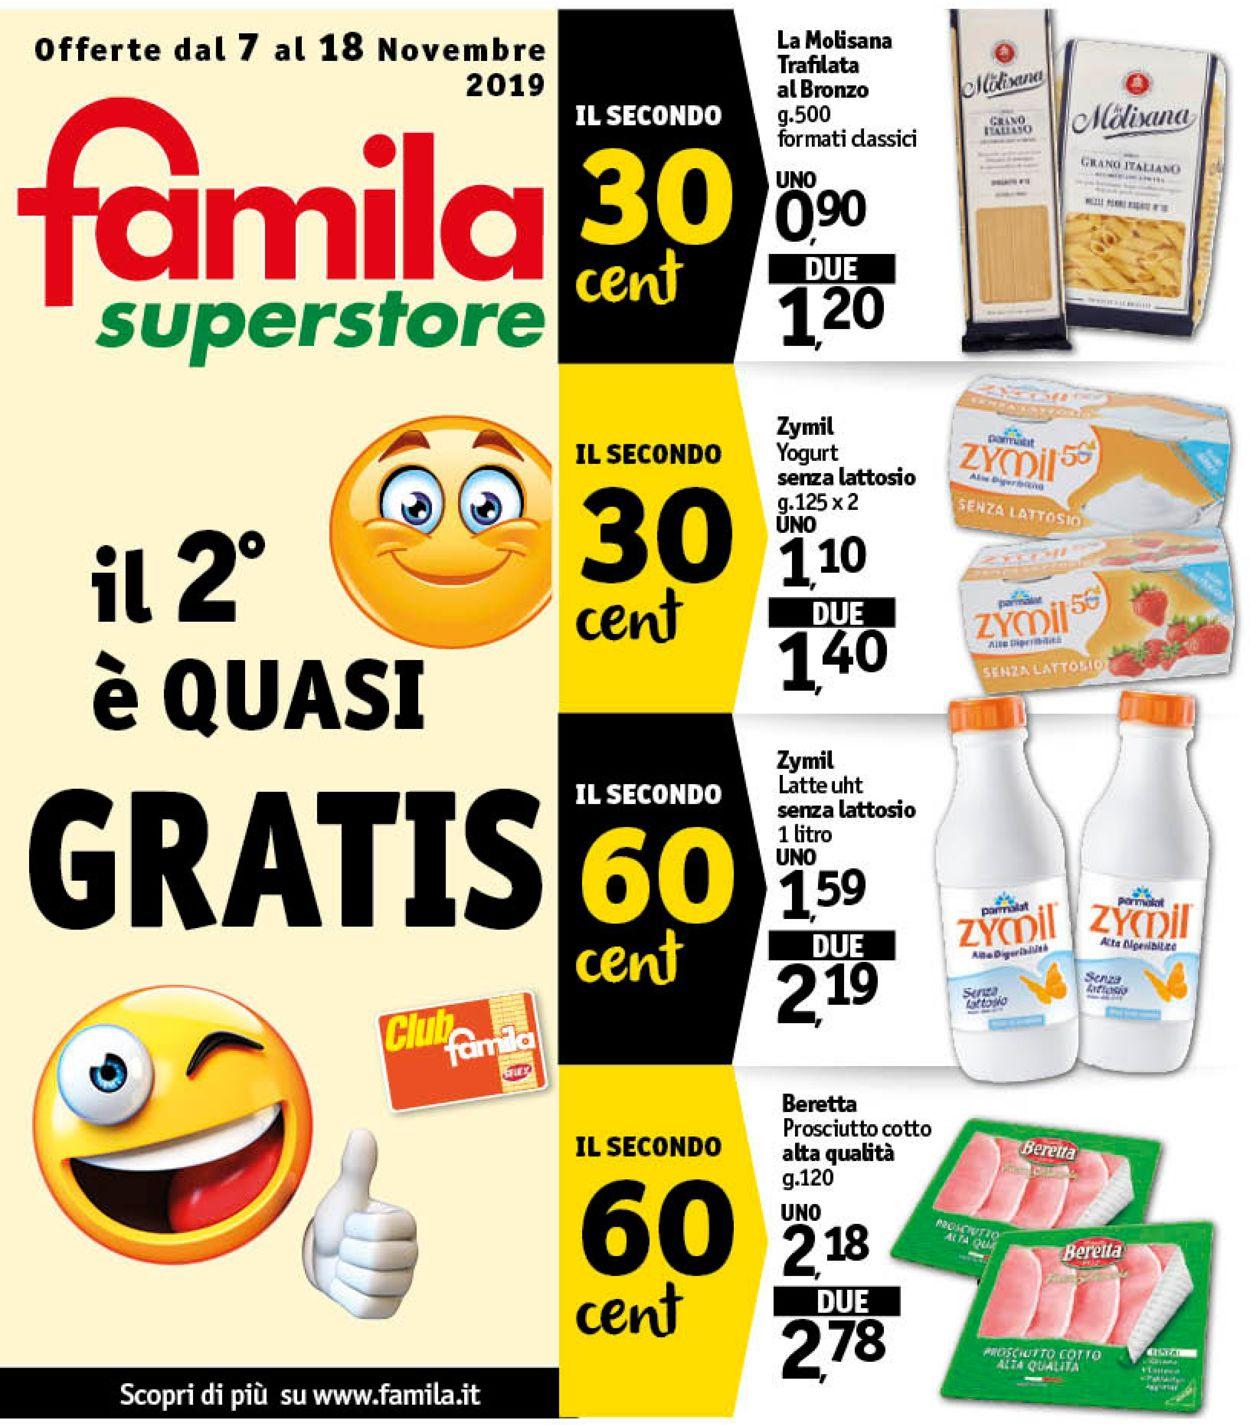 Volantino Famila - Offerte 07/11-18/11/2019